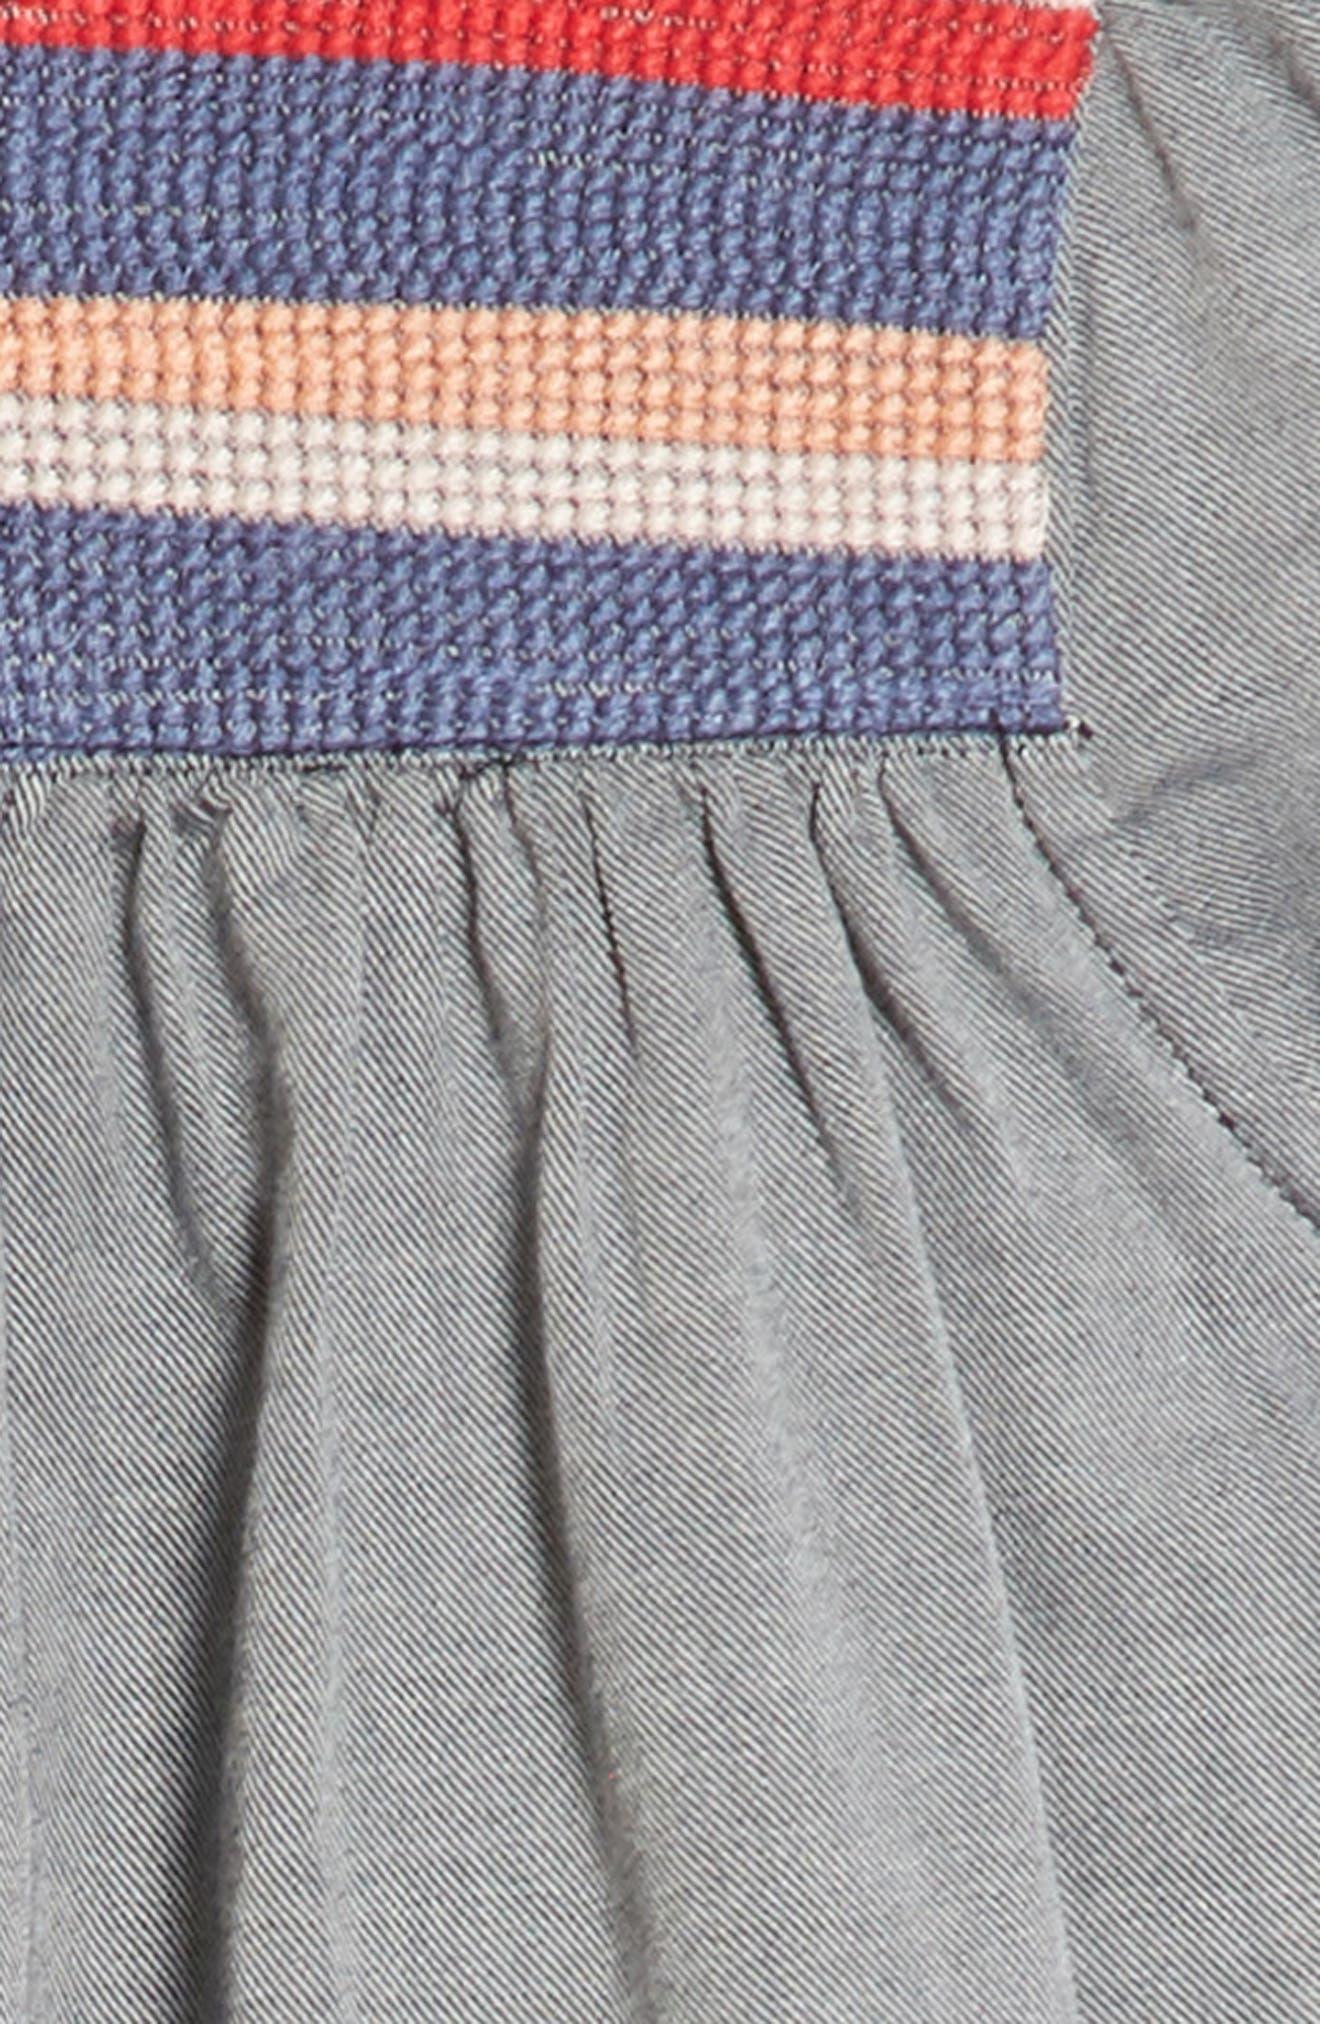 Embroidered Yoke Shift Dress,                             Alternate thumbnail 3, color,                             412